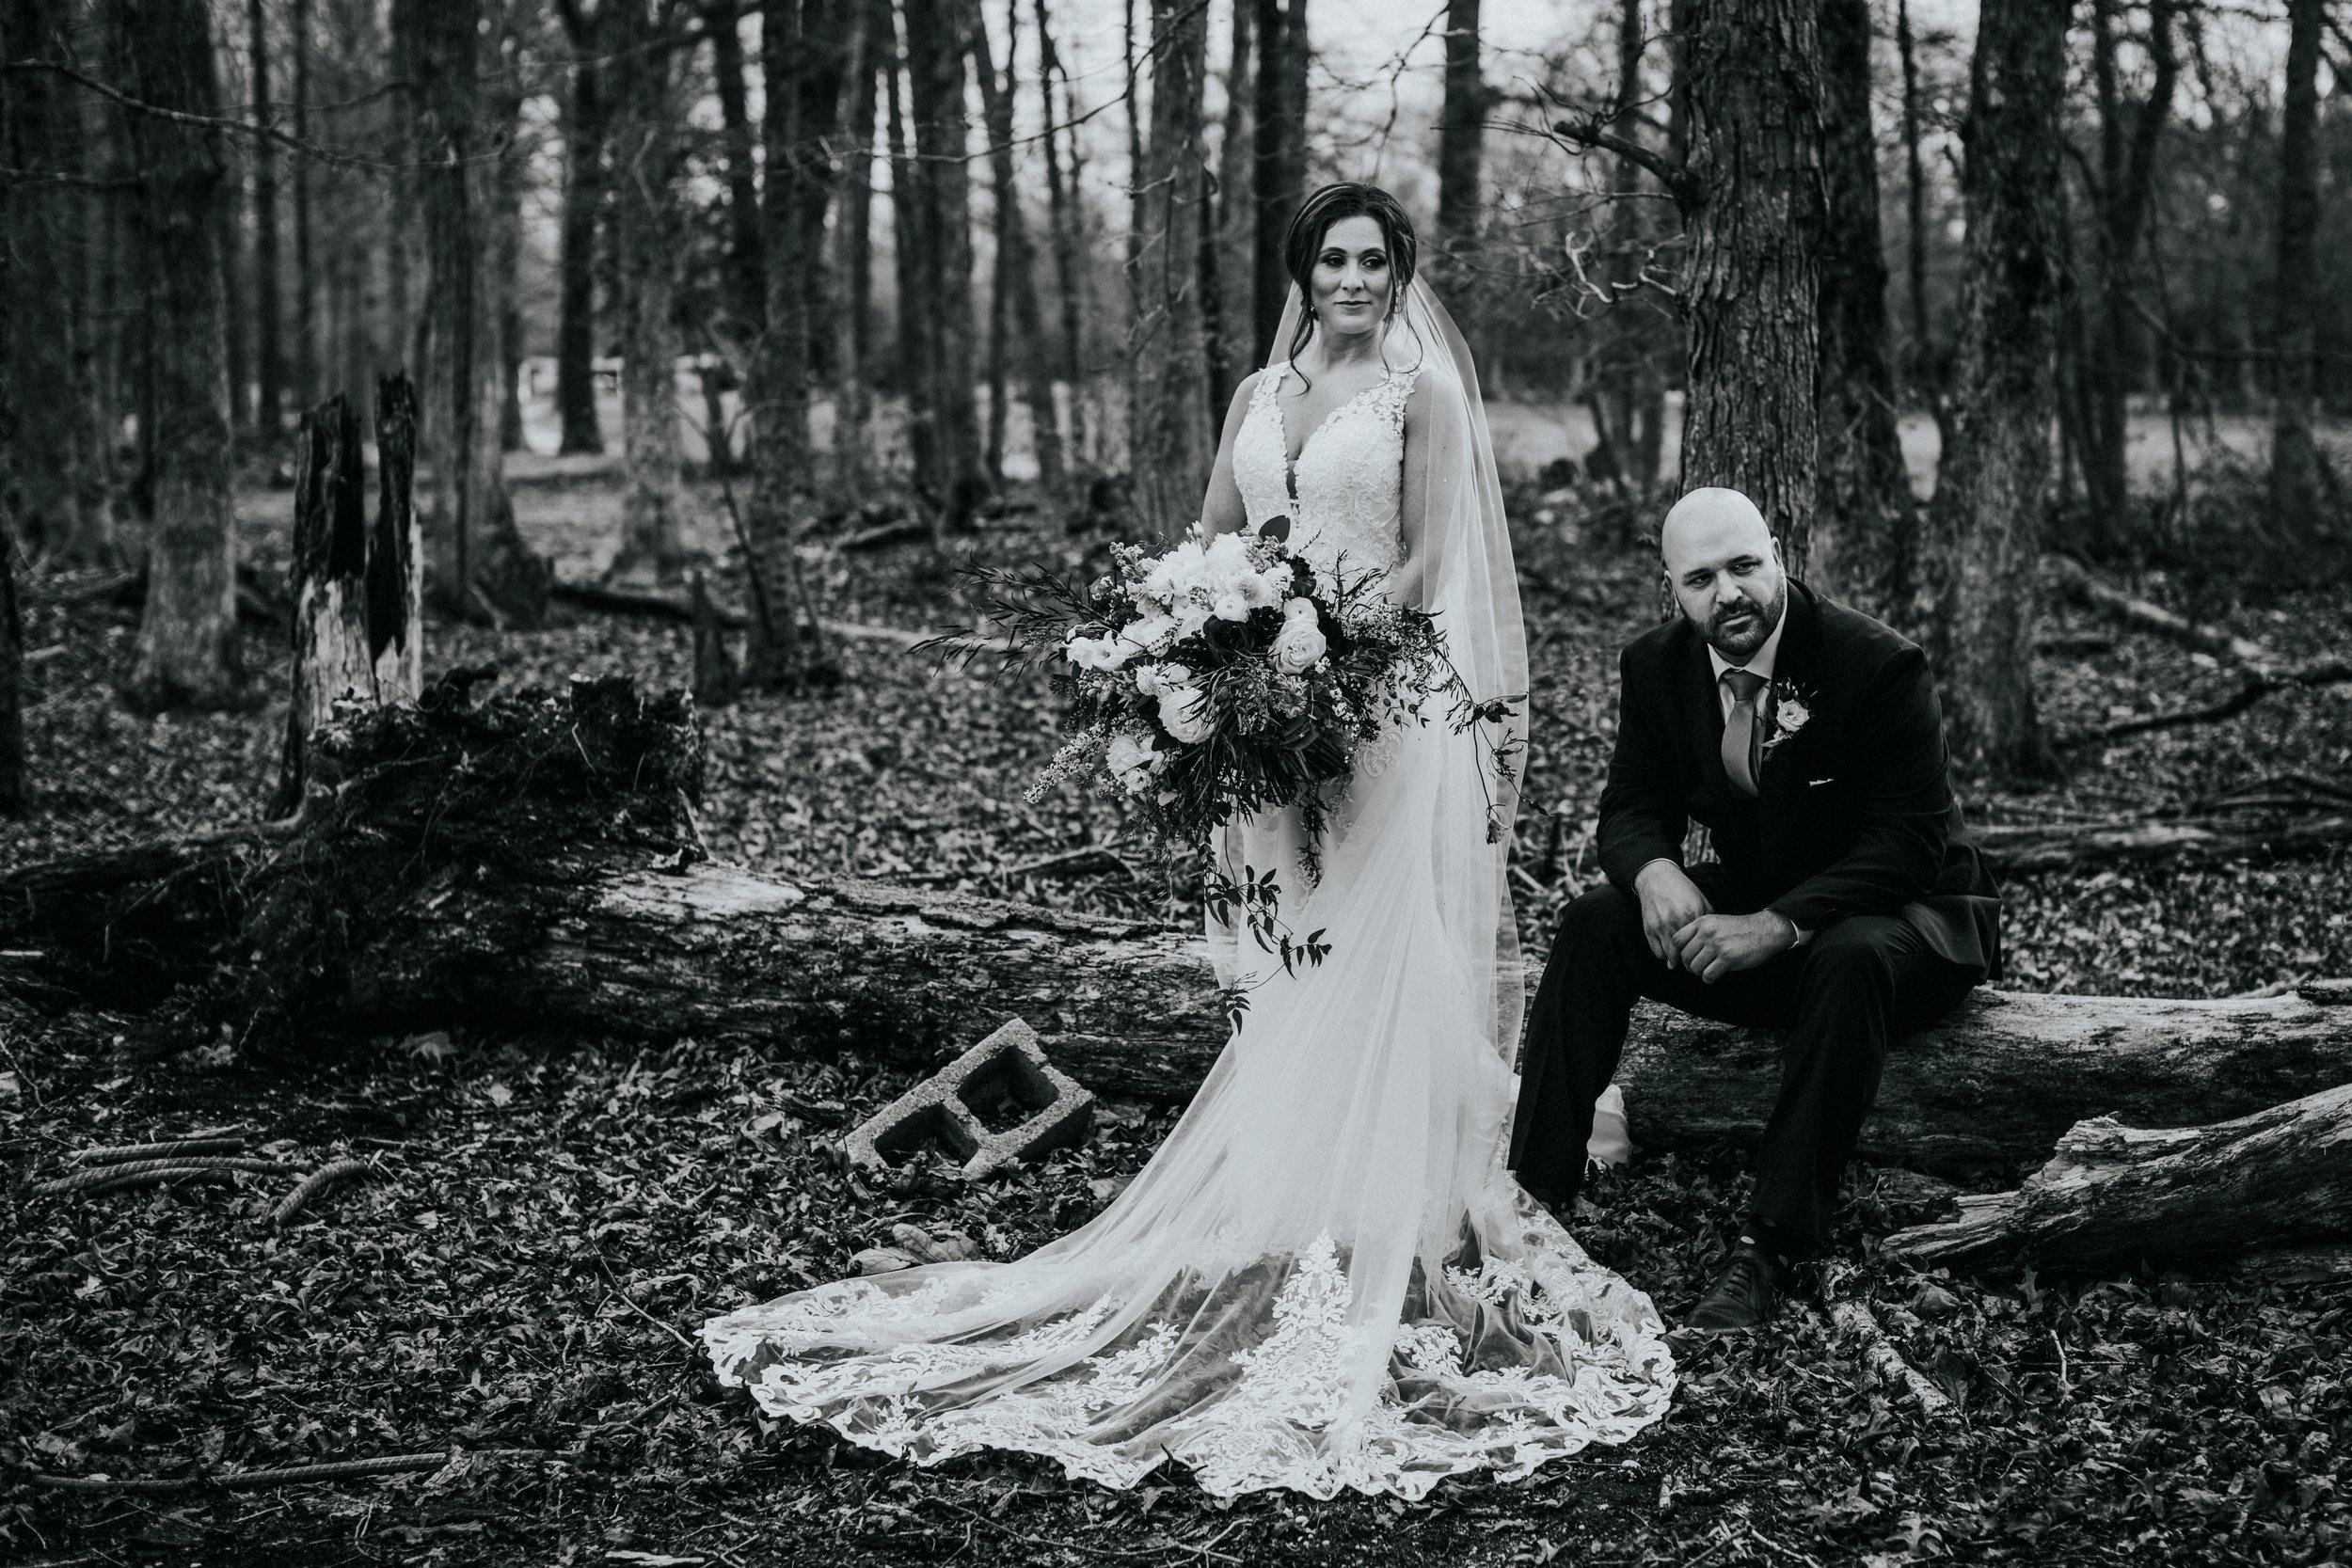 New-Jersey-Wedding-Photographer-JennaLynnPhotography-Grove-at-Centerton-Wedding-Cait&BobPreview-6.jpg